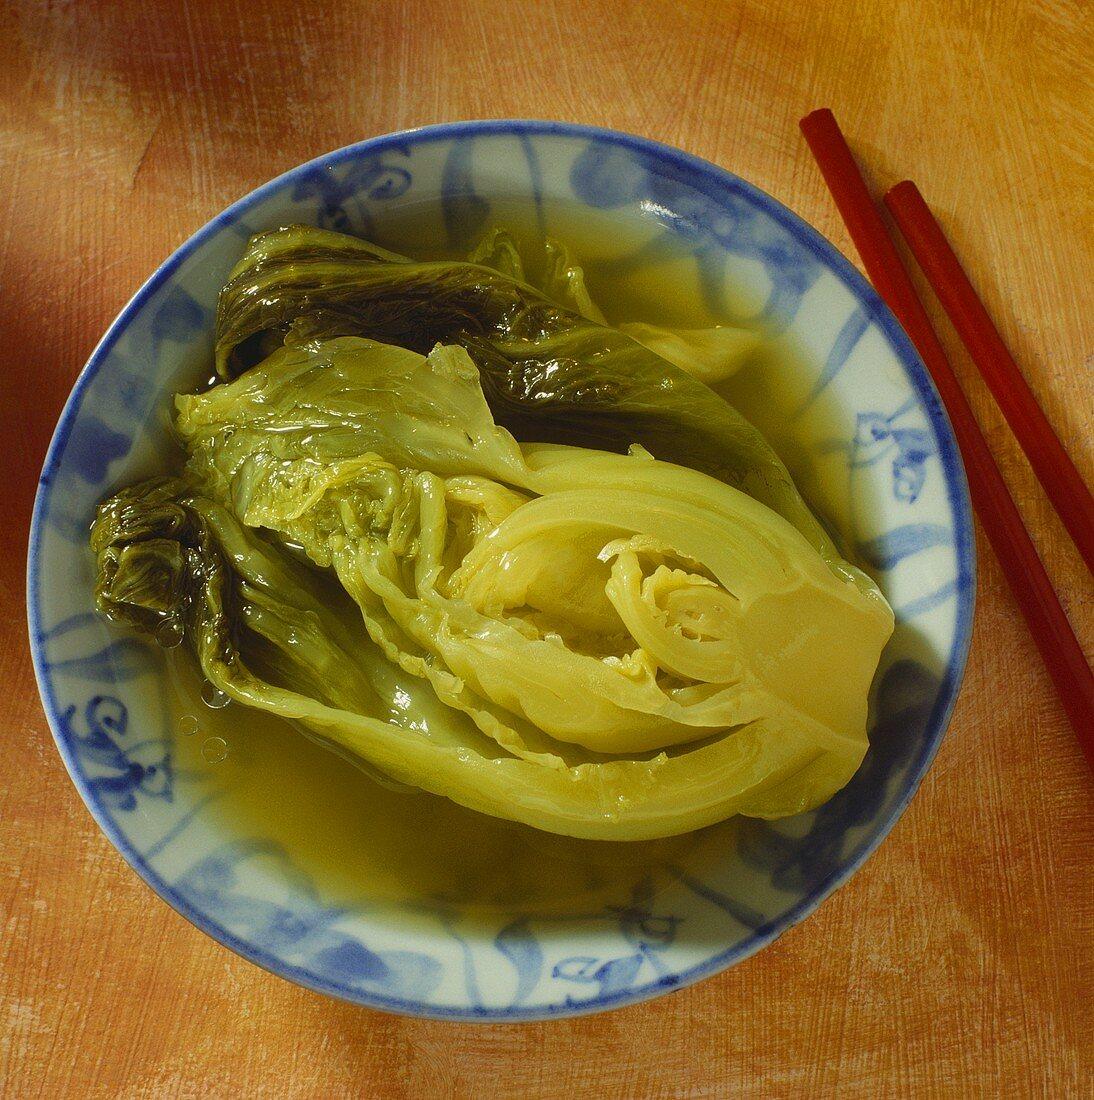 Chinese sauerkraut (pickled Chinese cabbage) in bowl